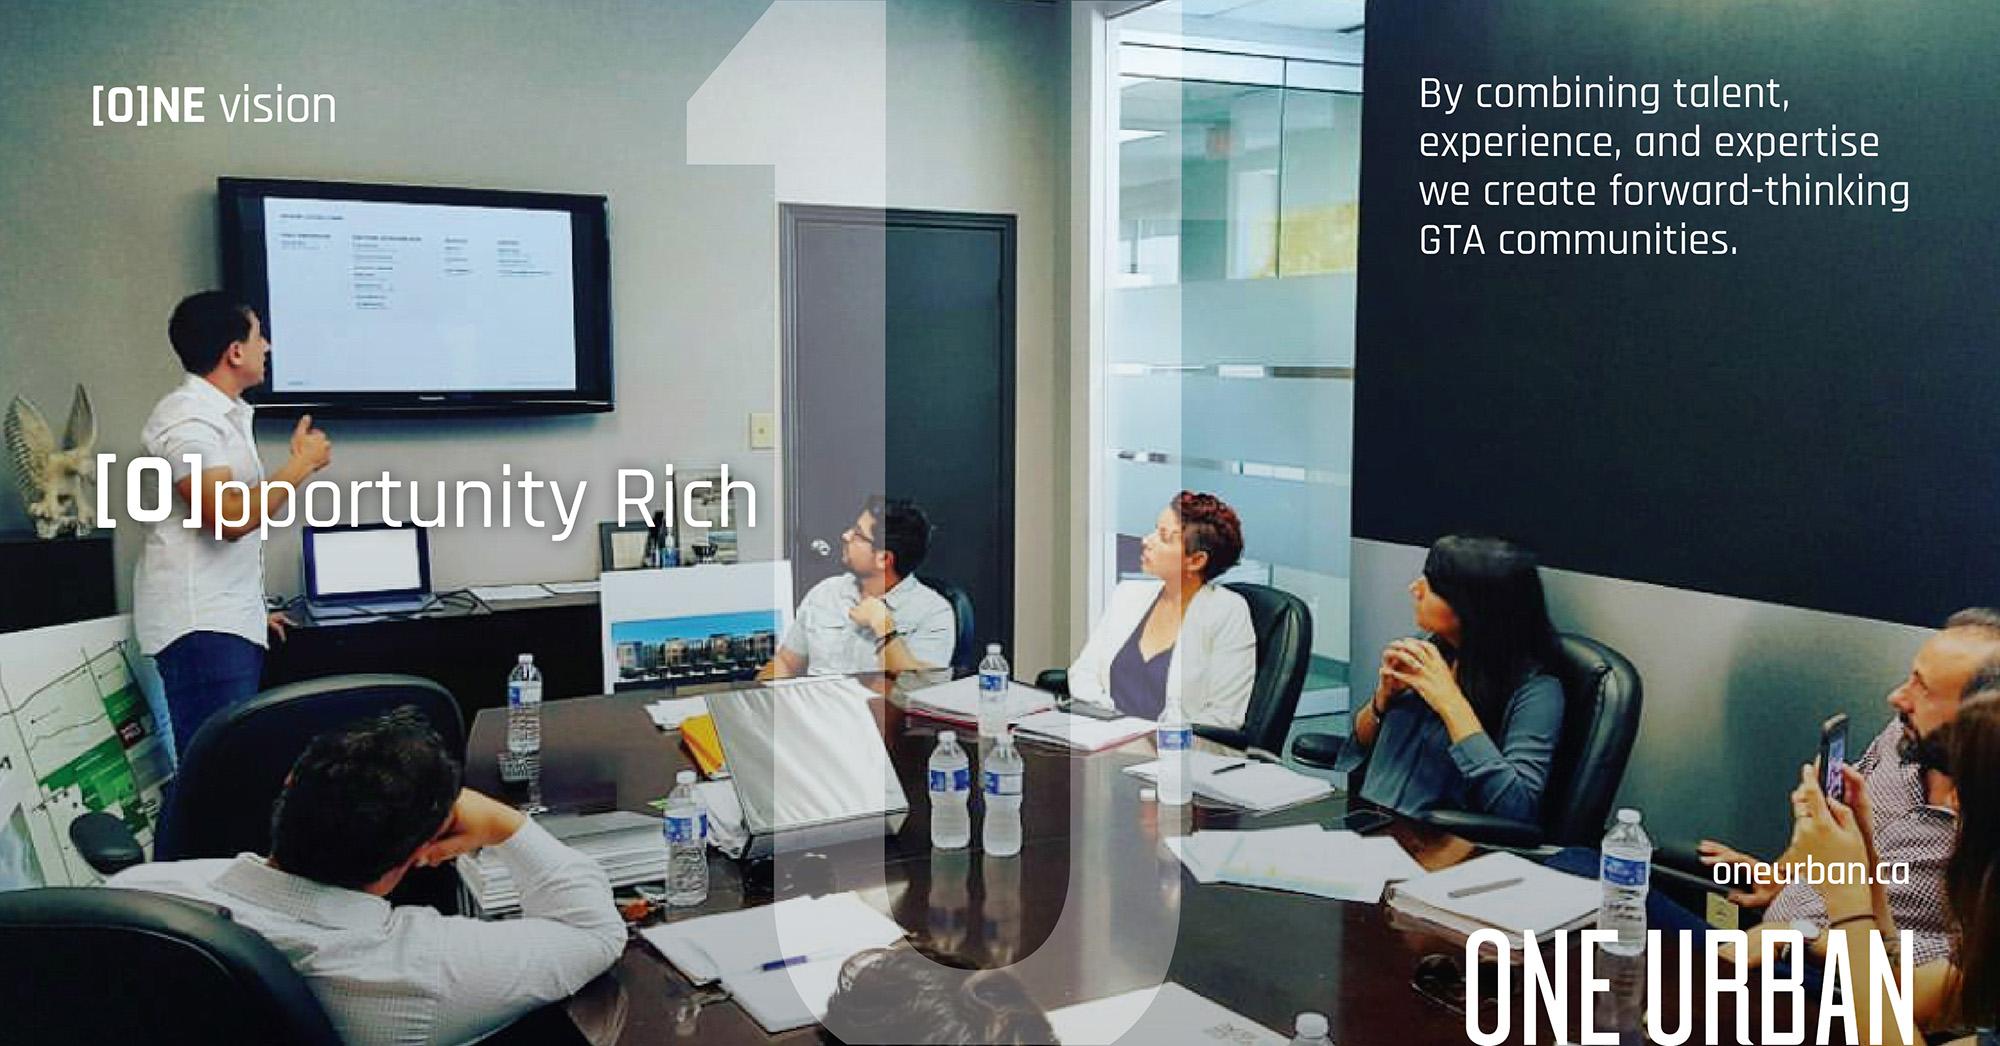 OneUrban_Opportunity-Rich.jpg